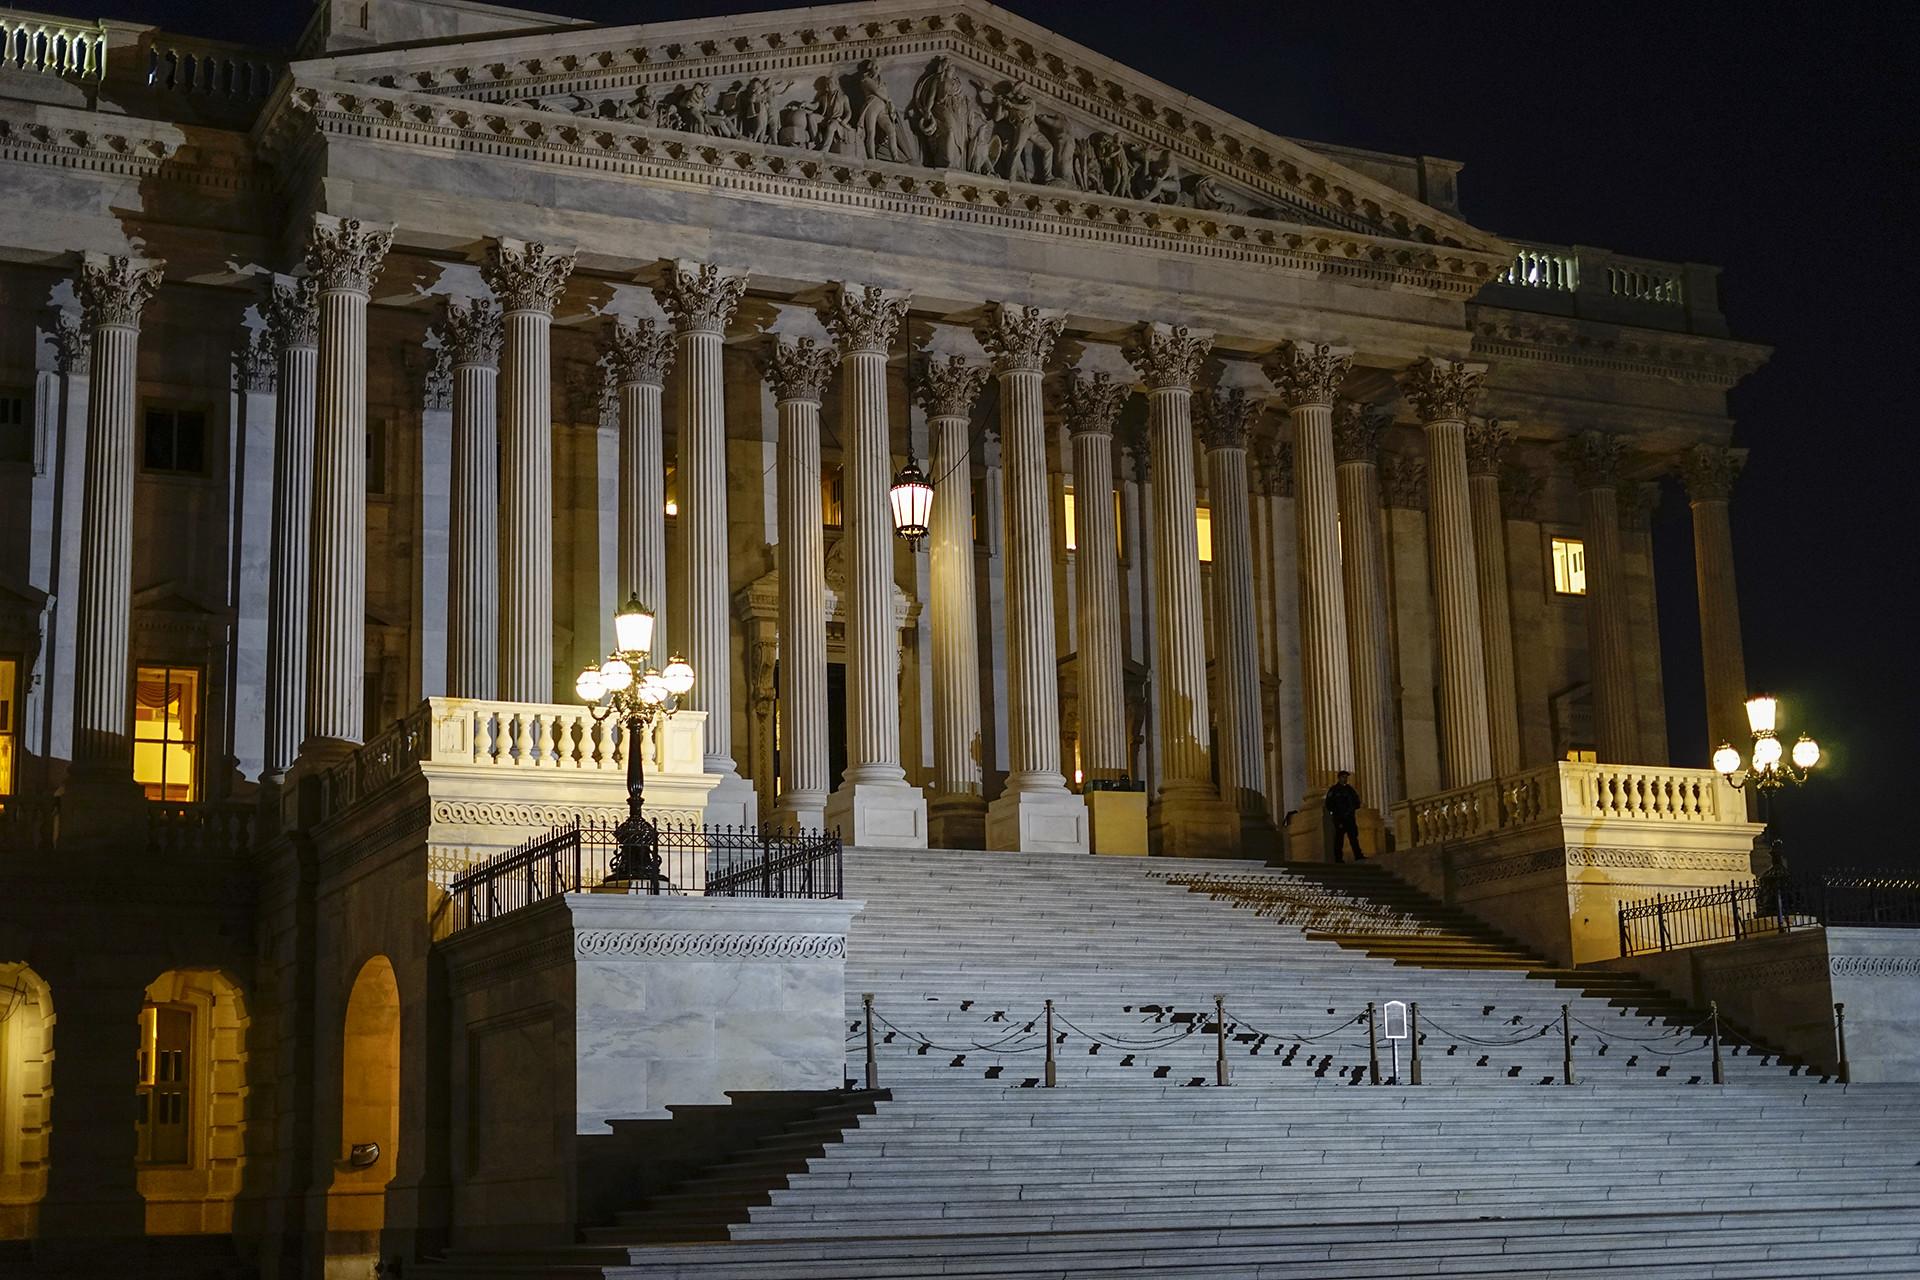 Trump wants impeachment trial in Senate with Bidens, whistleblower testifying - Spokesman